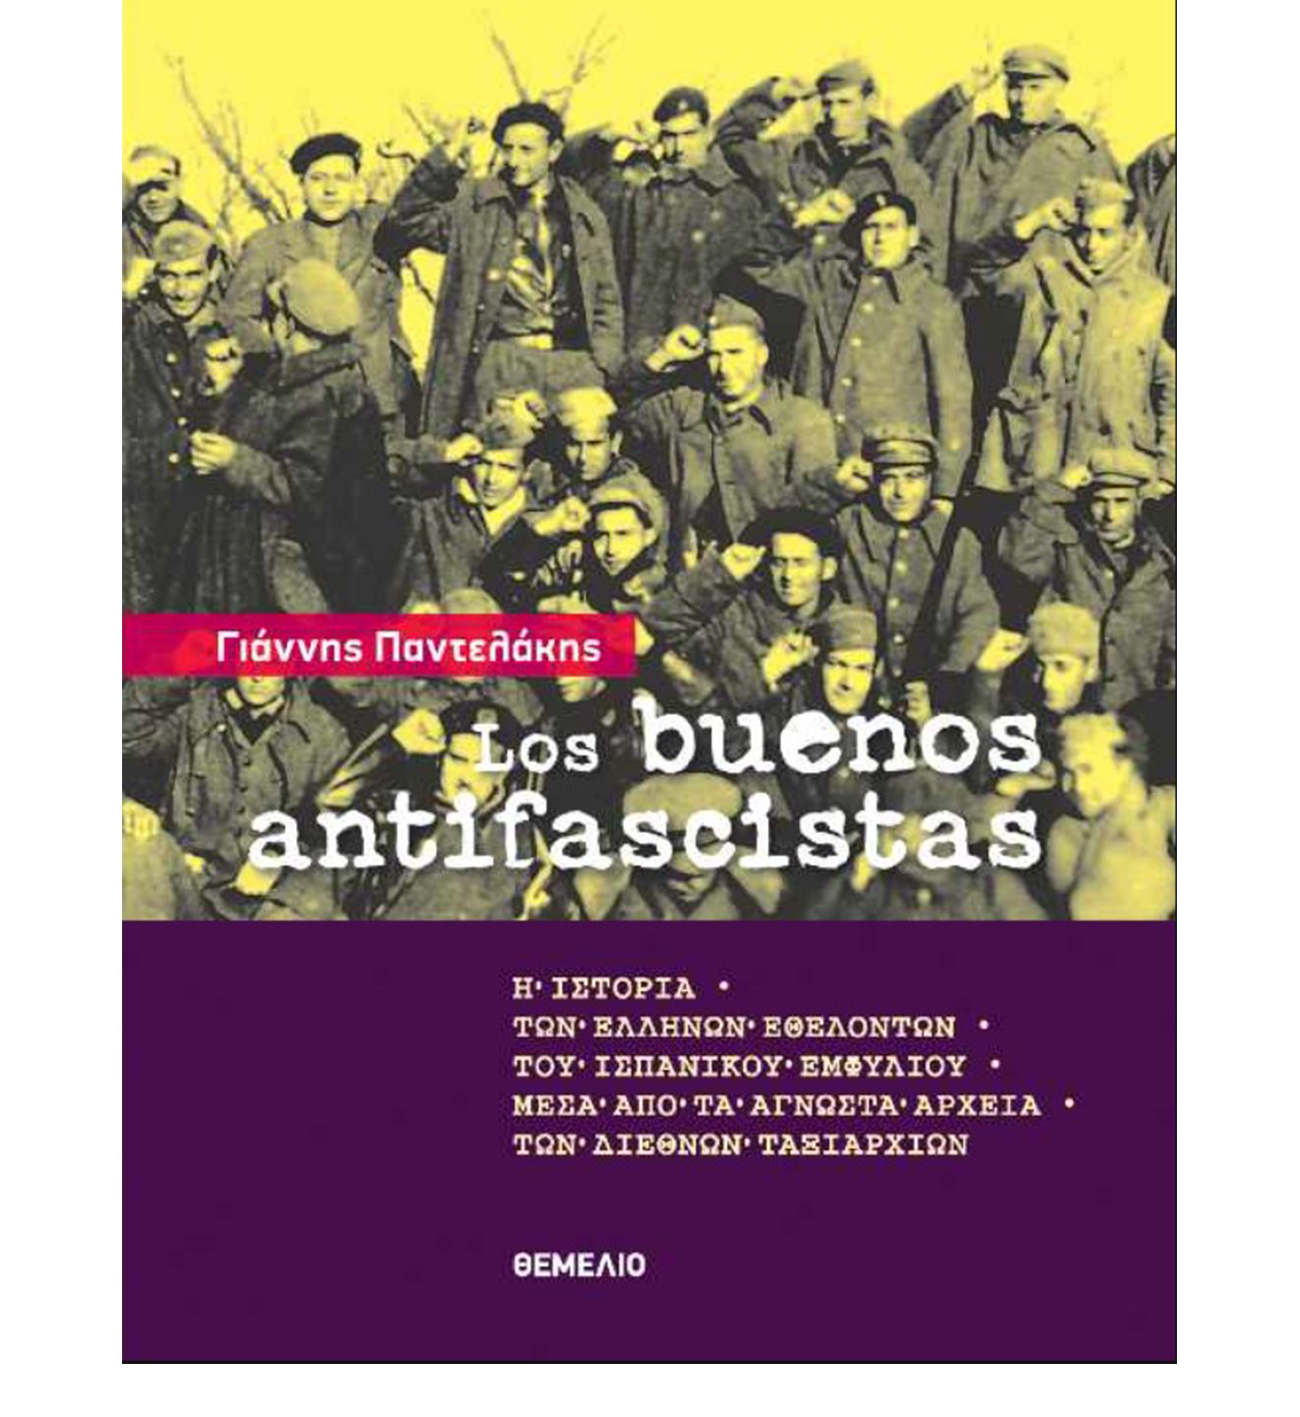 «Los buenos antifascistas» – Η ελληνική συμμετοχή στον Ισπανικό Εμφύλιο στο νέο βιβλίο του Γ. Παντελάκη